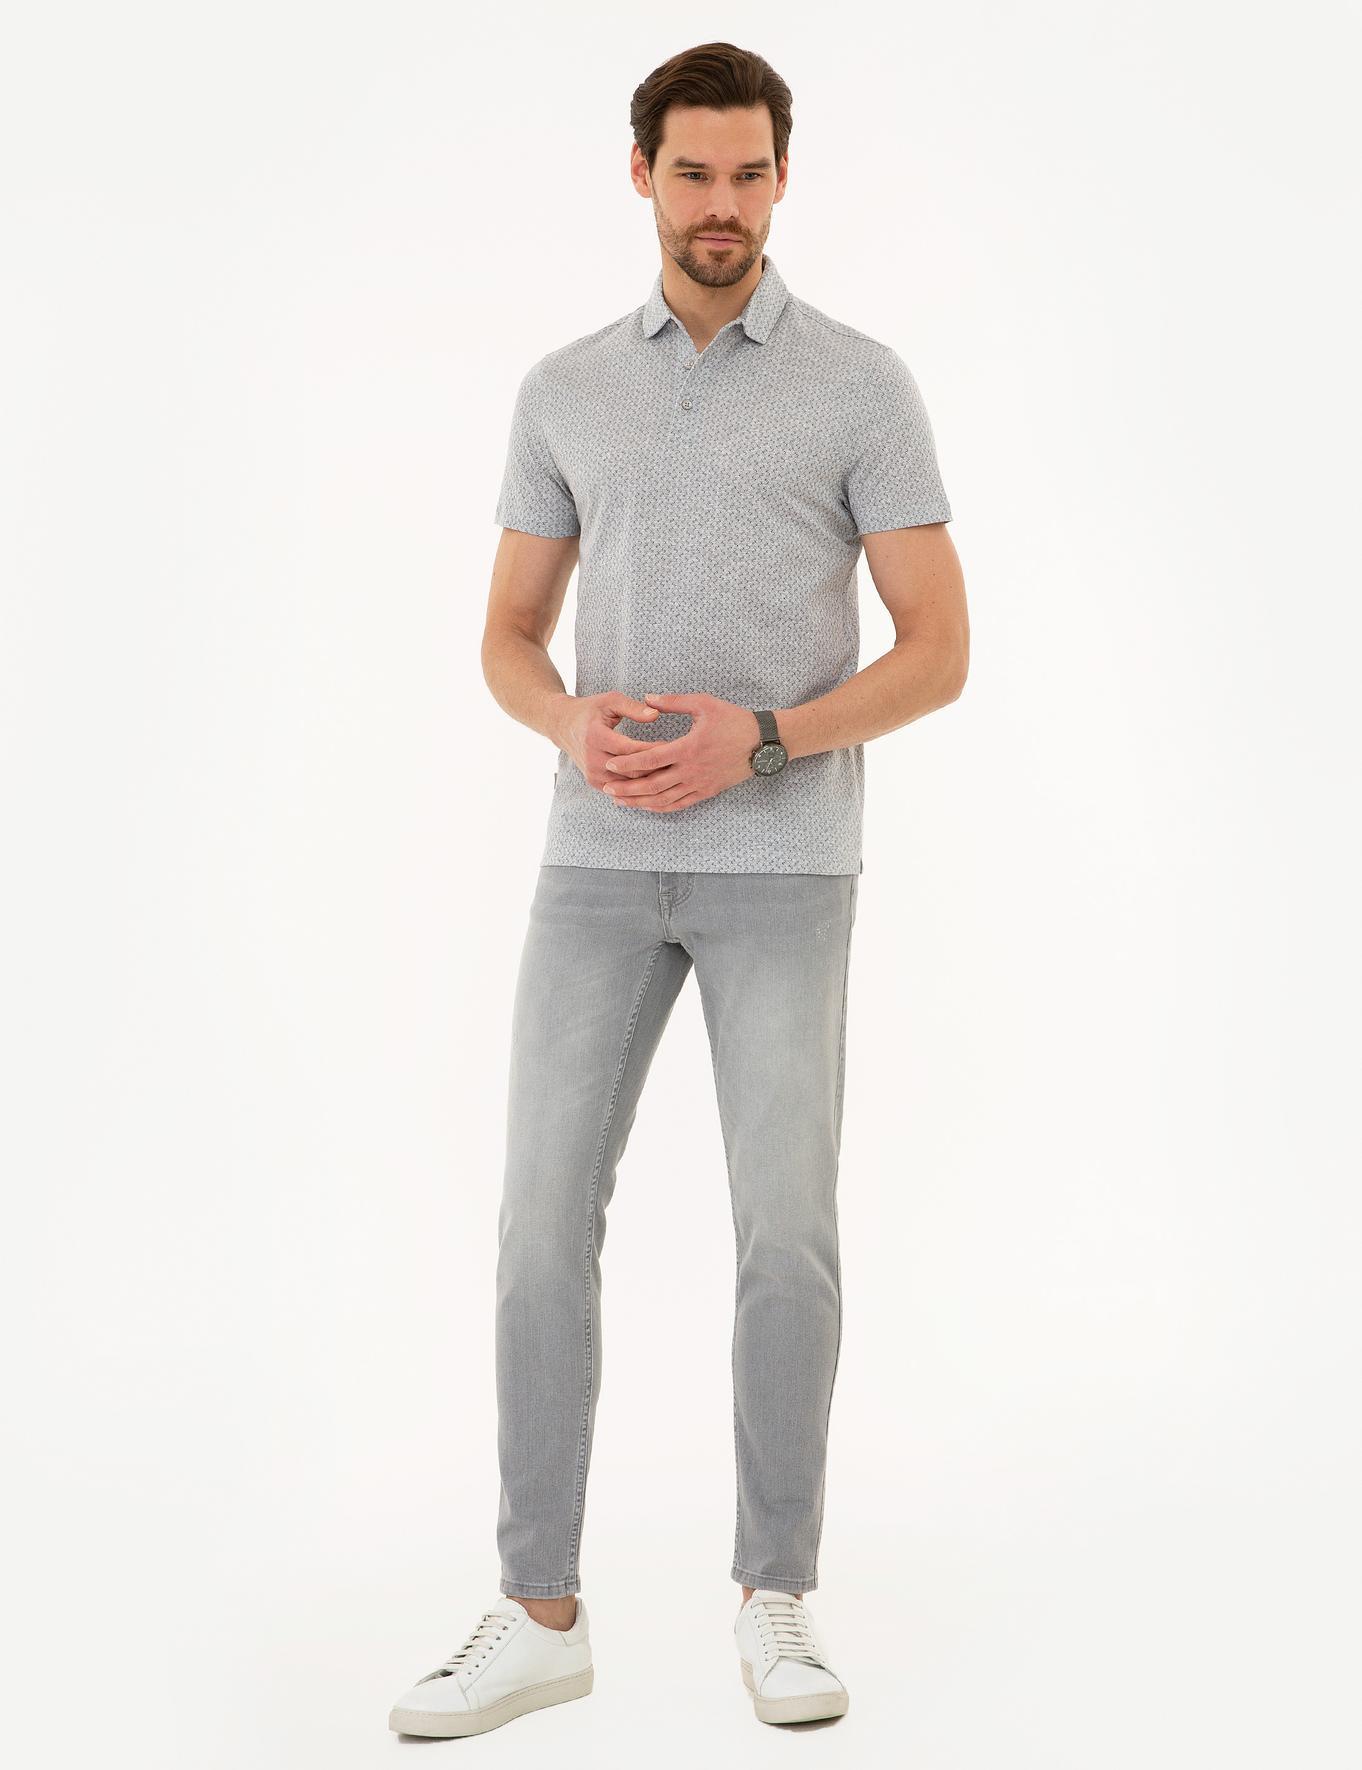 Açık Gri Slim Fit Merserize Polo Yaka T-Shirt